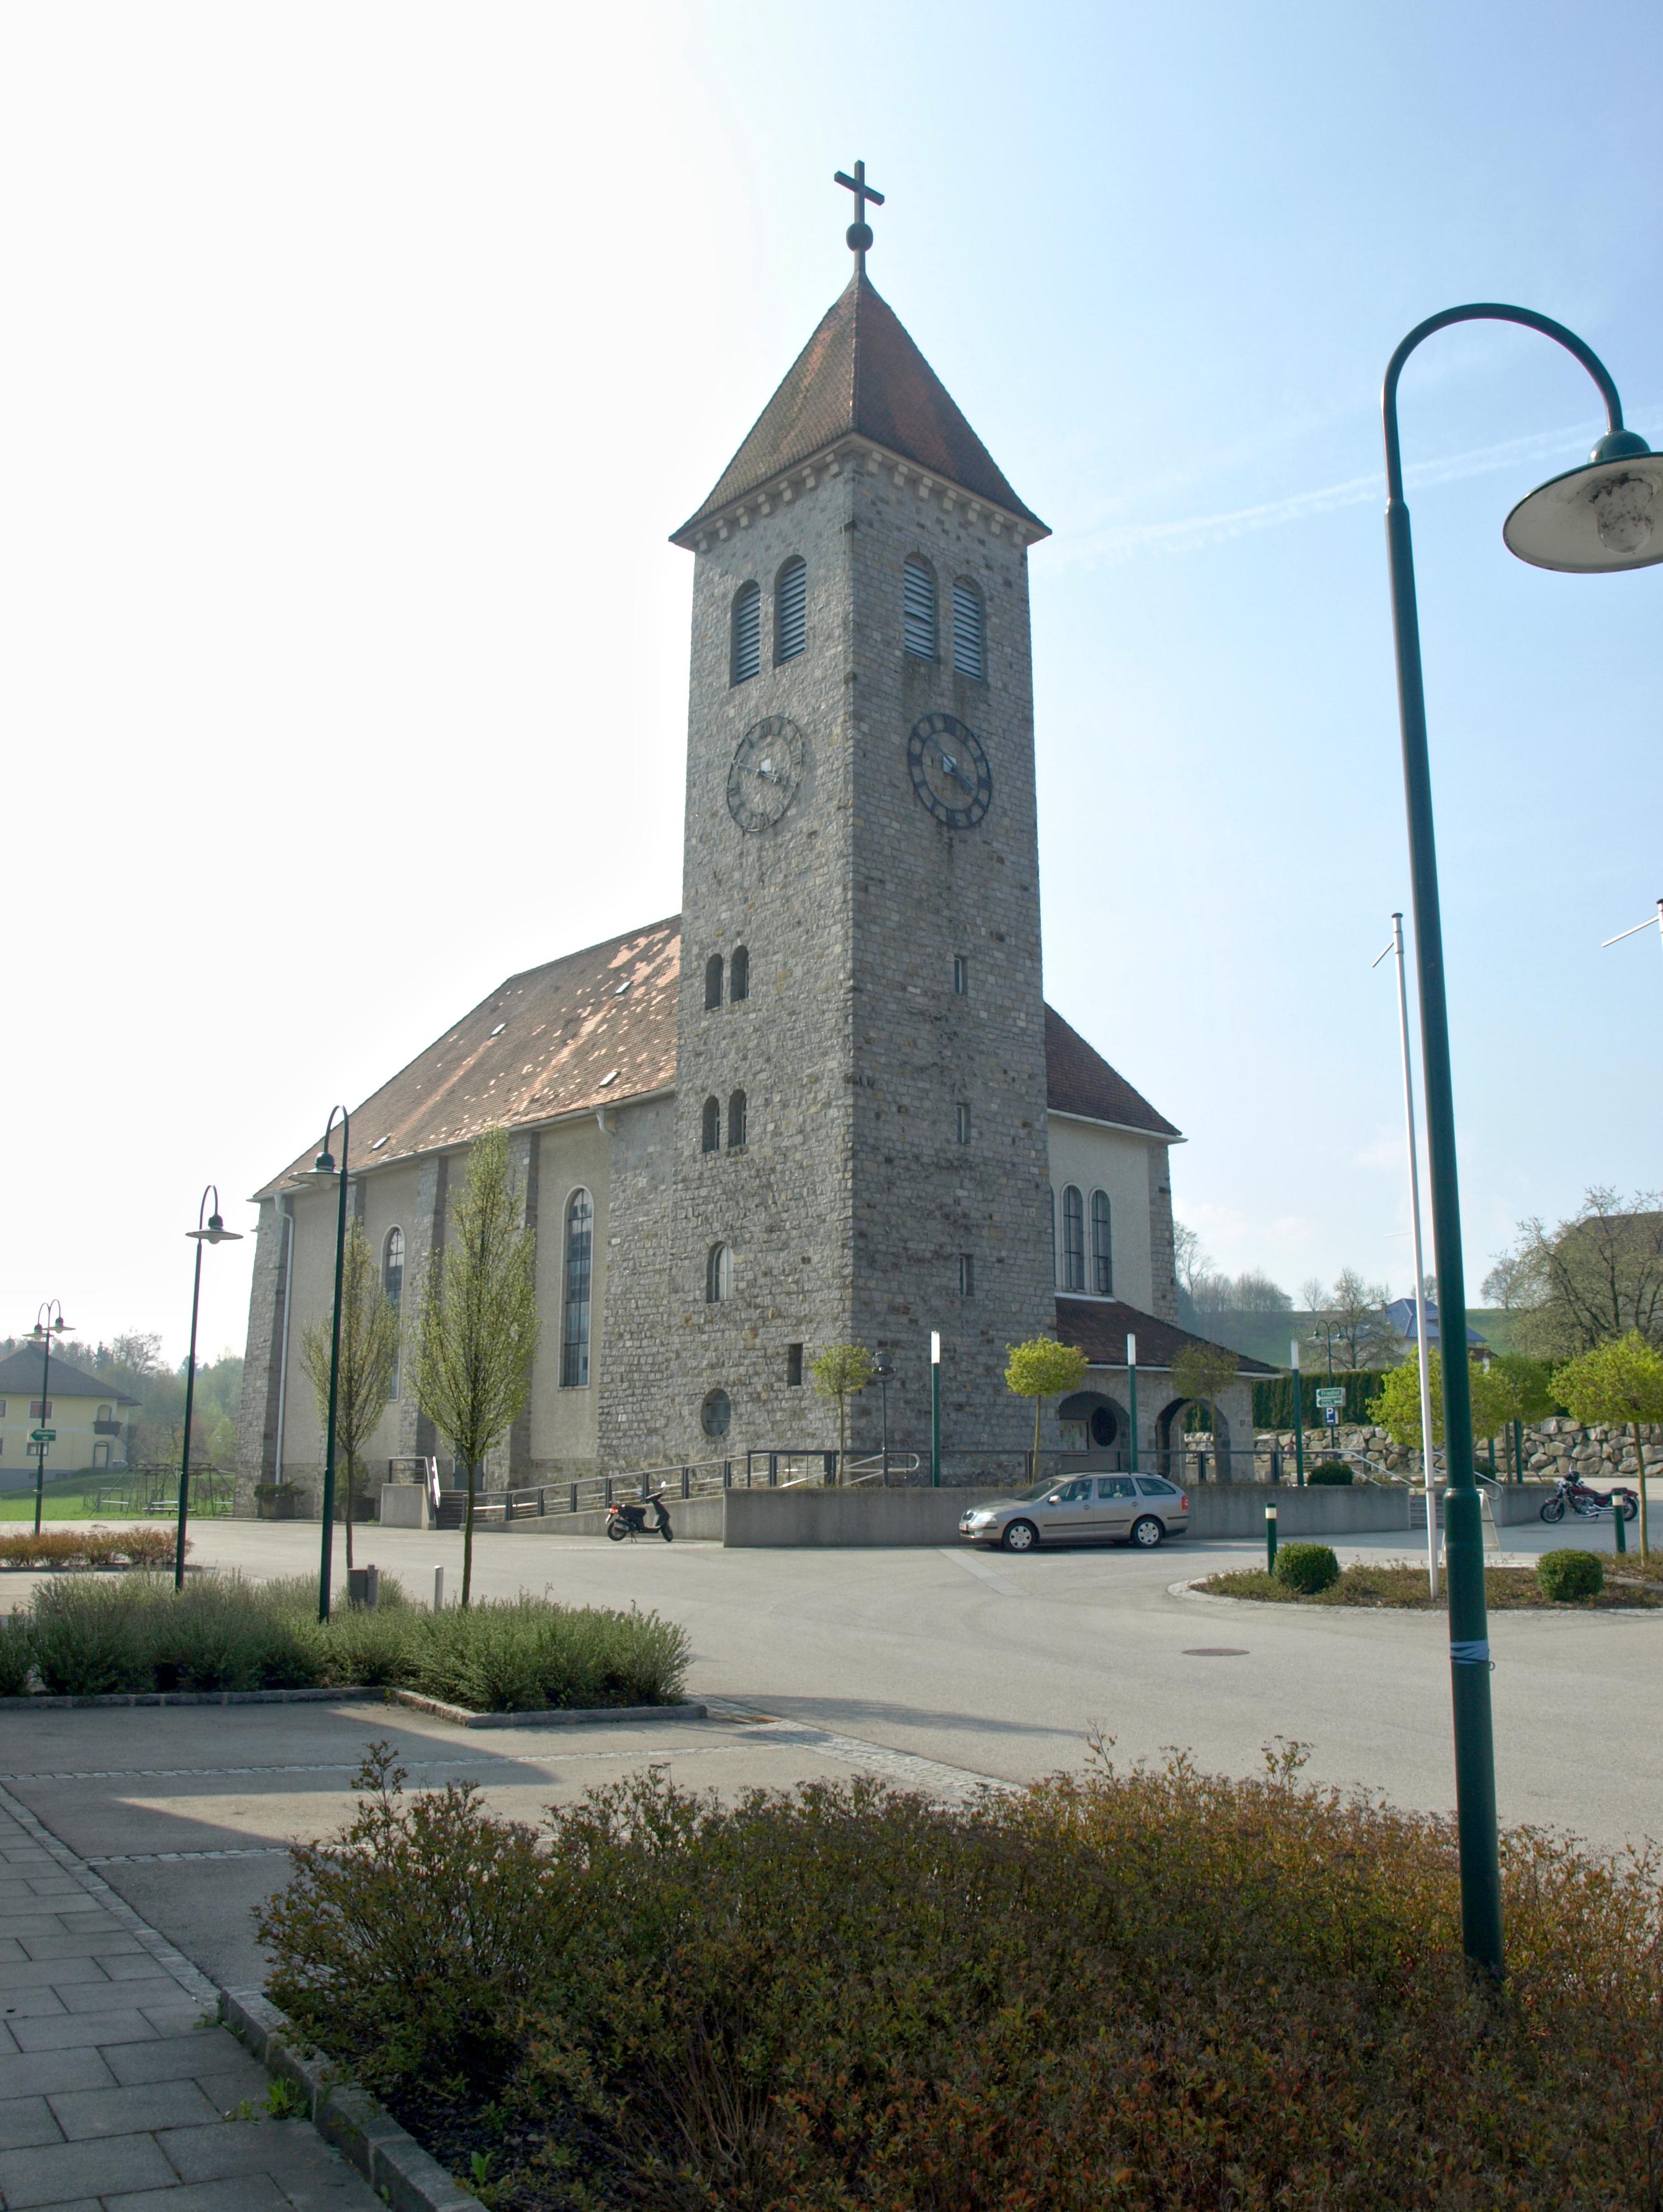 Trilogie Cafe - Beitrge - Haidershofen - Speisekarte, Preise